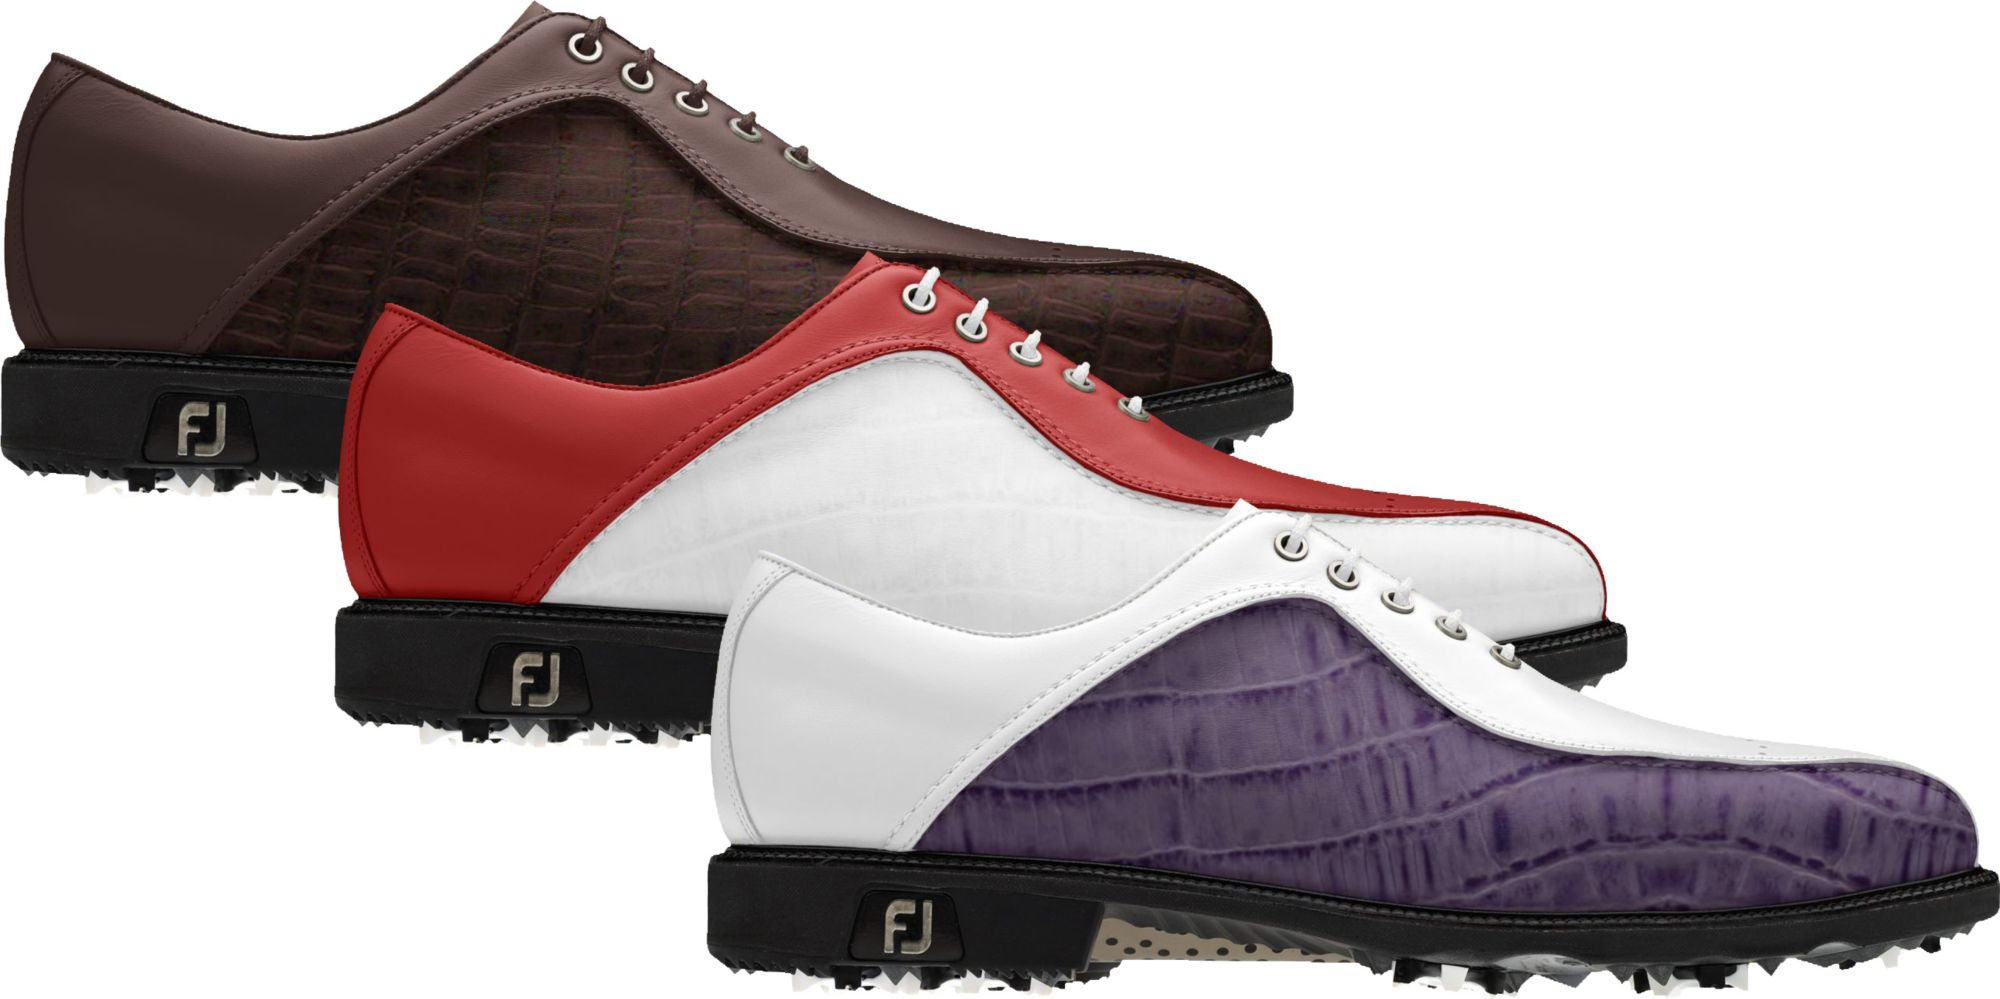 Footjoy Snakeskin Golf Shoes